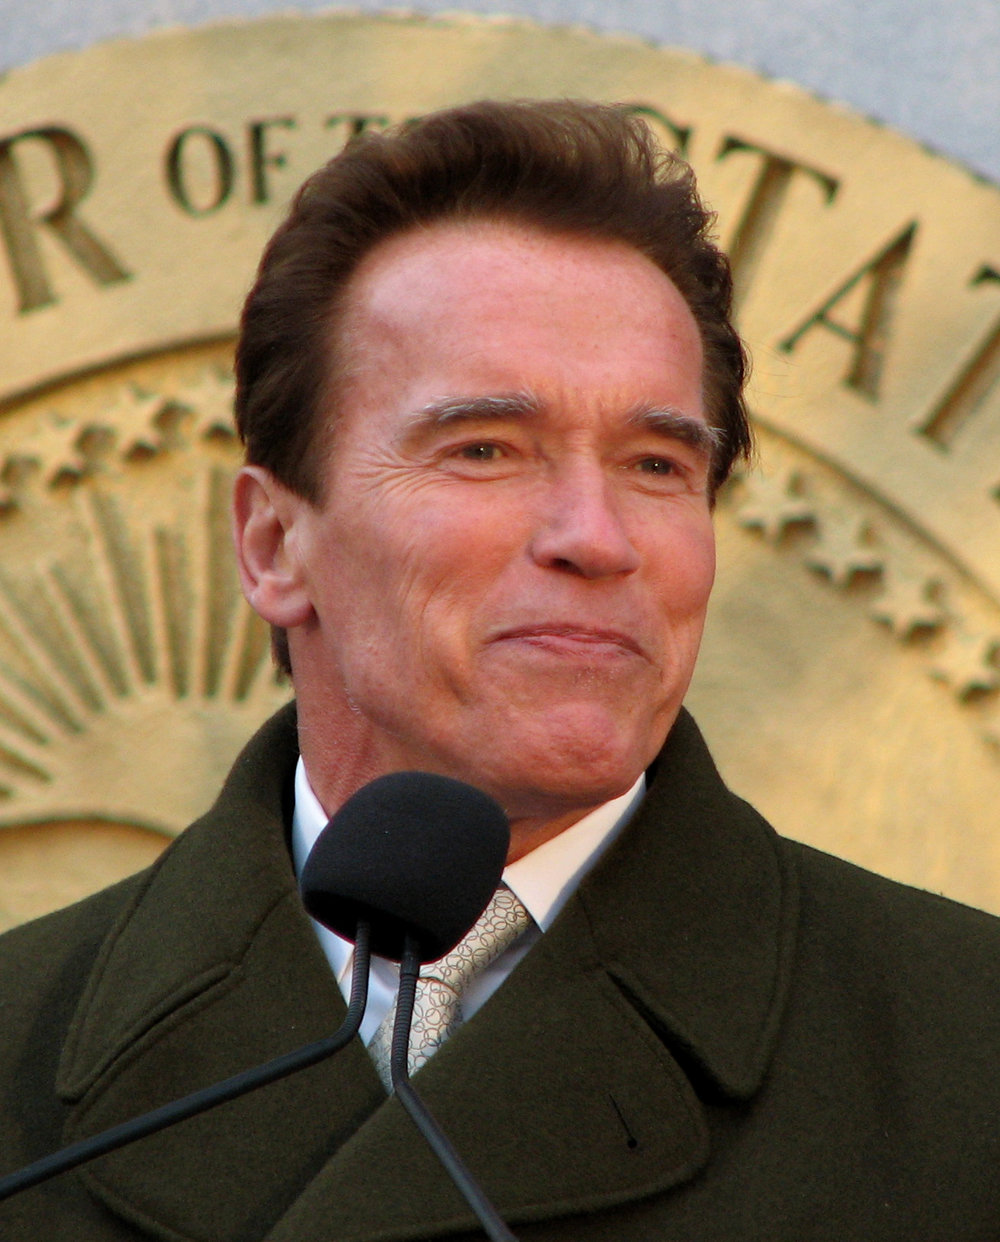 Arnold_Schwarzenegger_speech.jpg